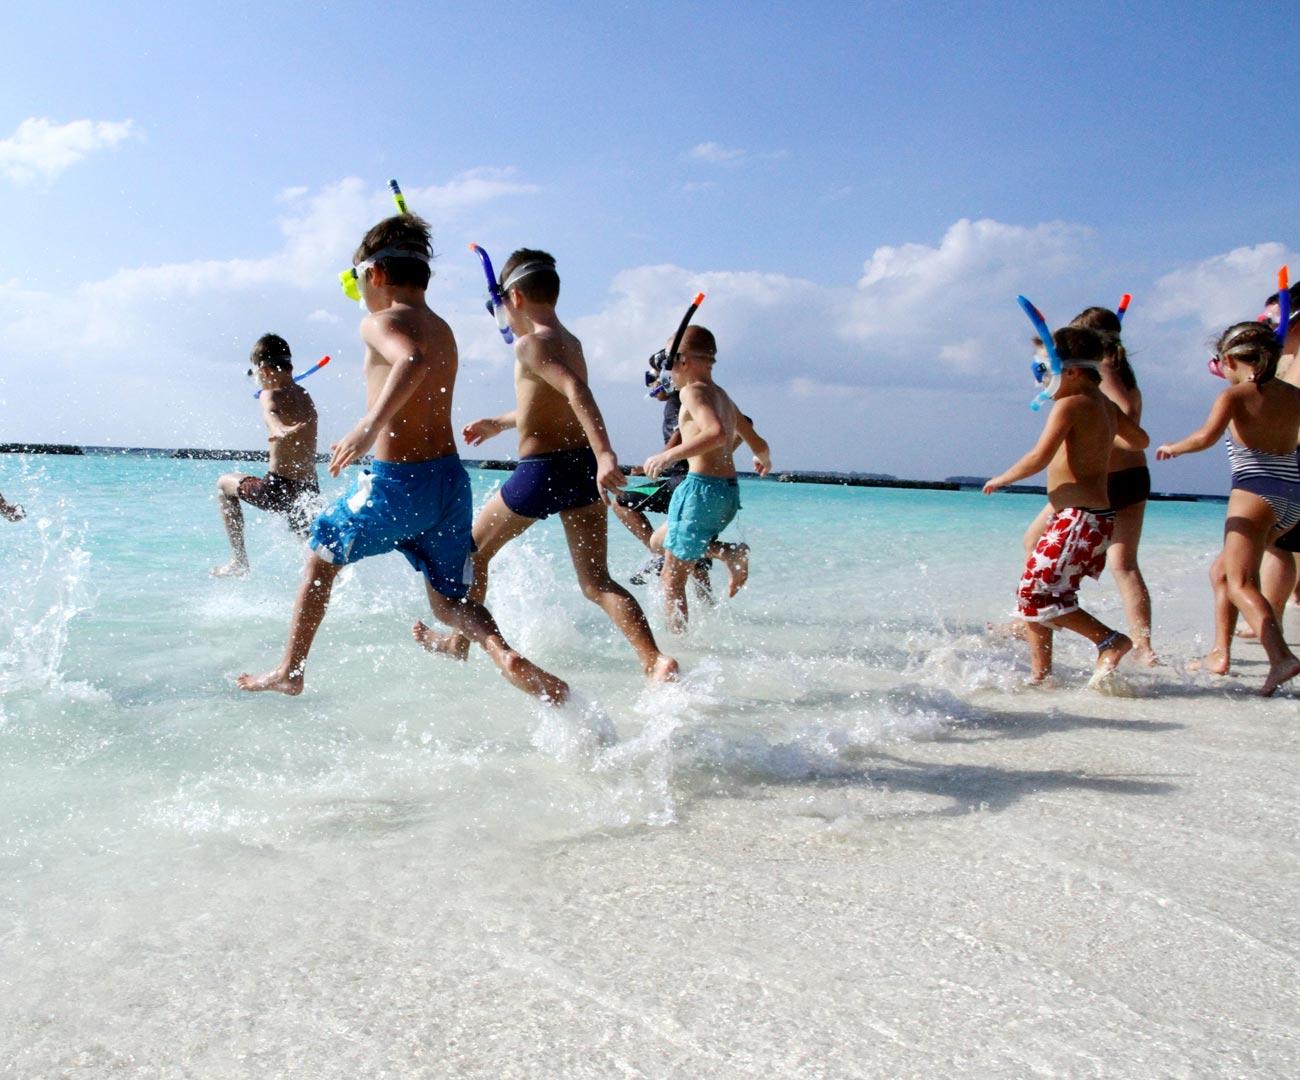 Maldives Kids Club Outdoor Activities Image | Kurumba Maldives Resort